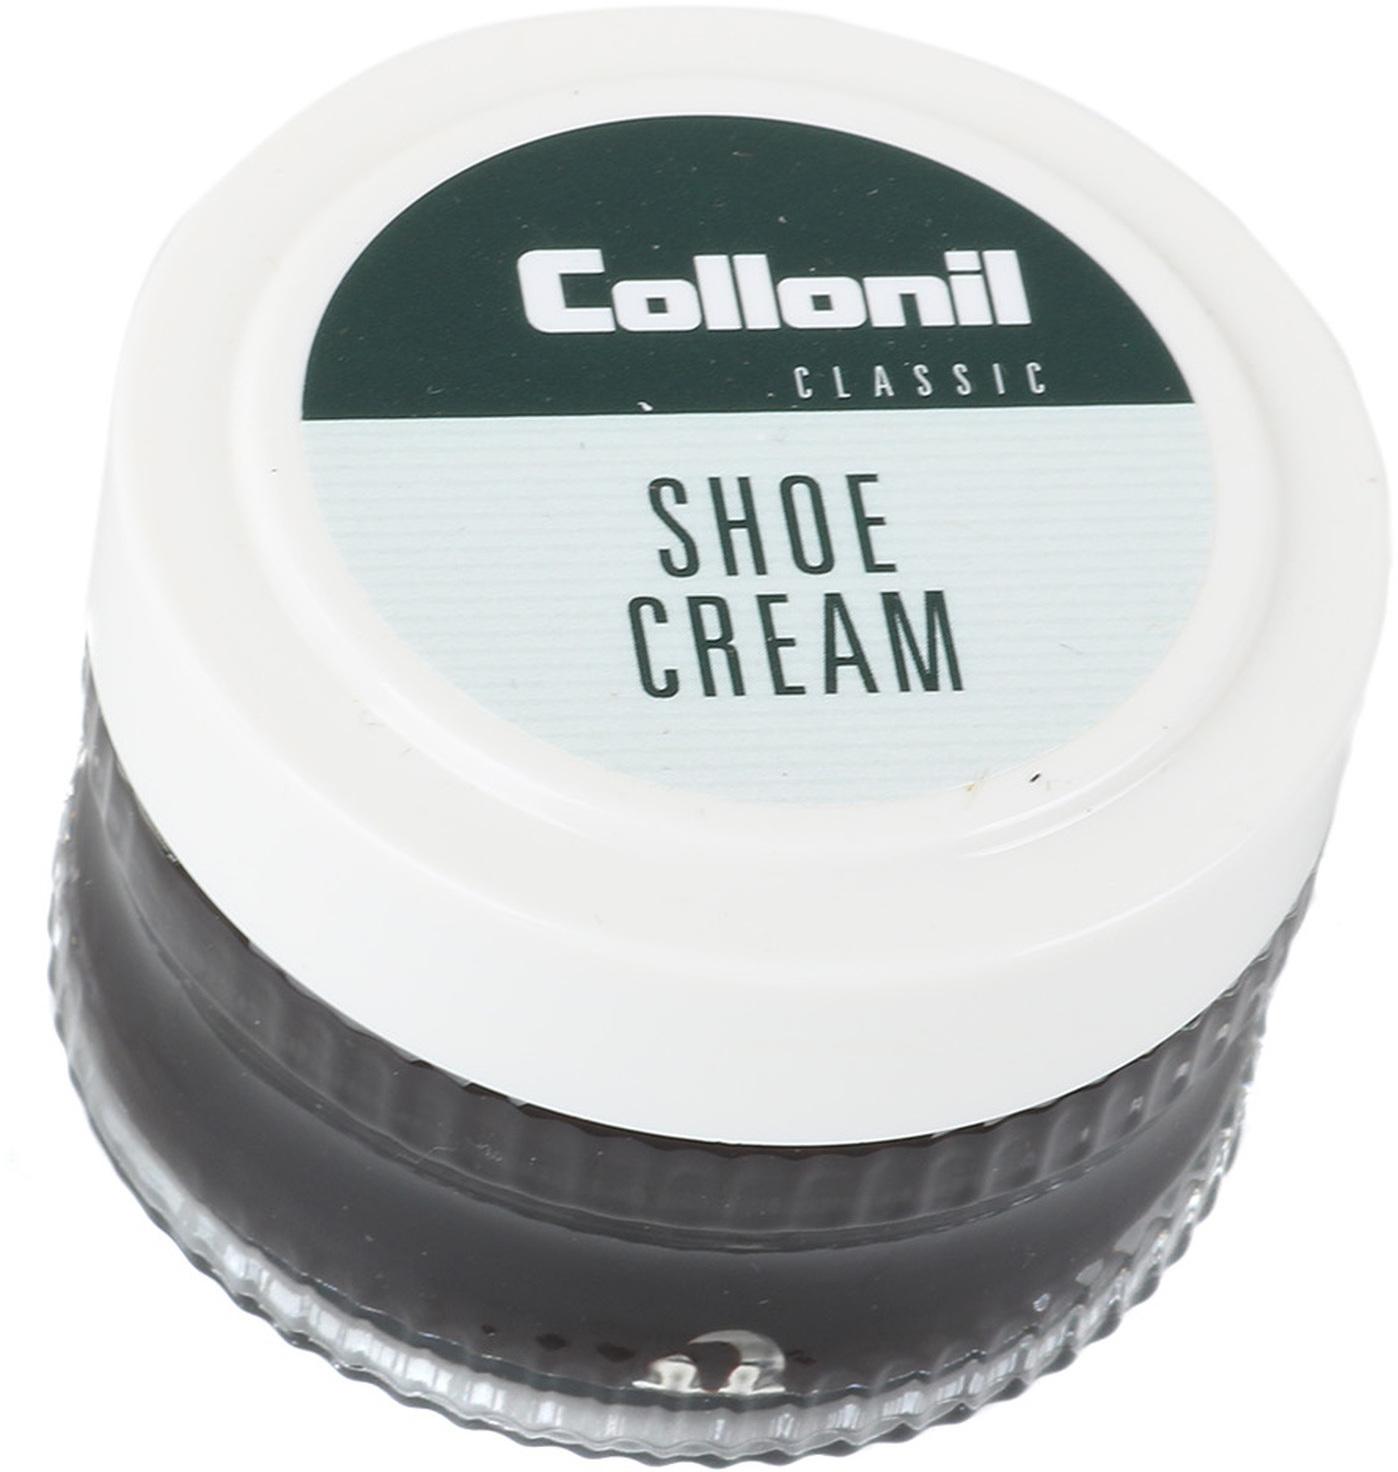 Collonil Shoe Cream Donkerbruin foto 0